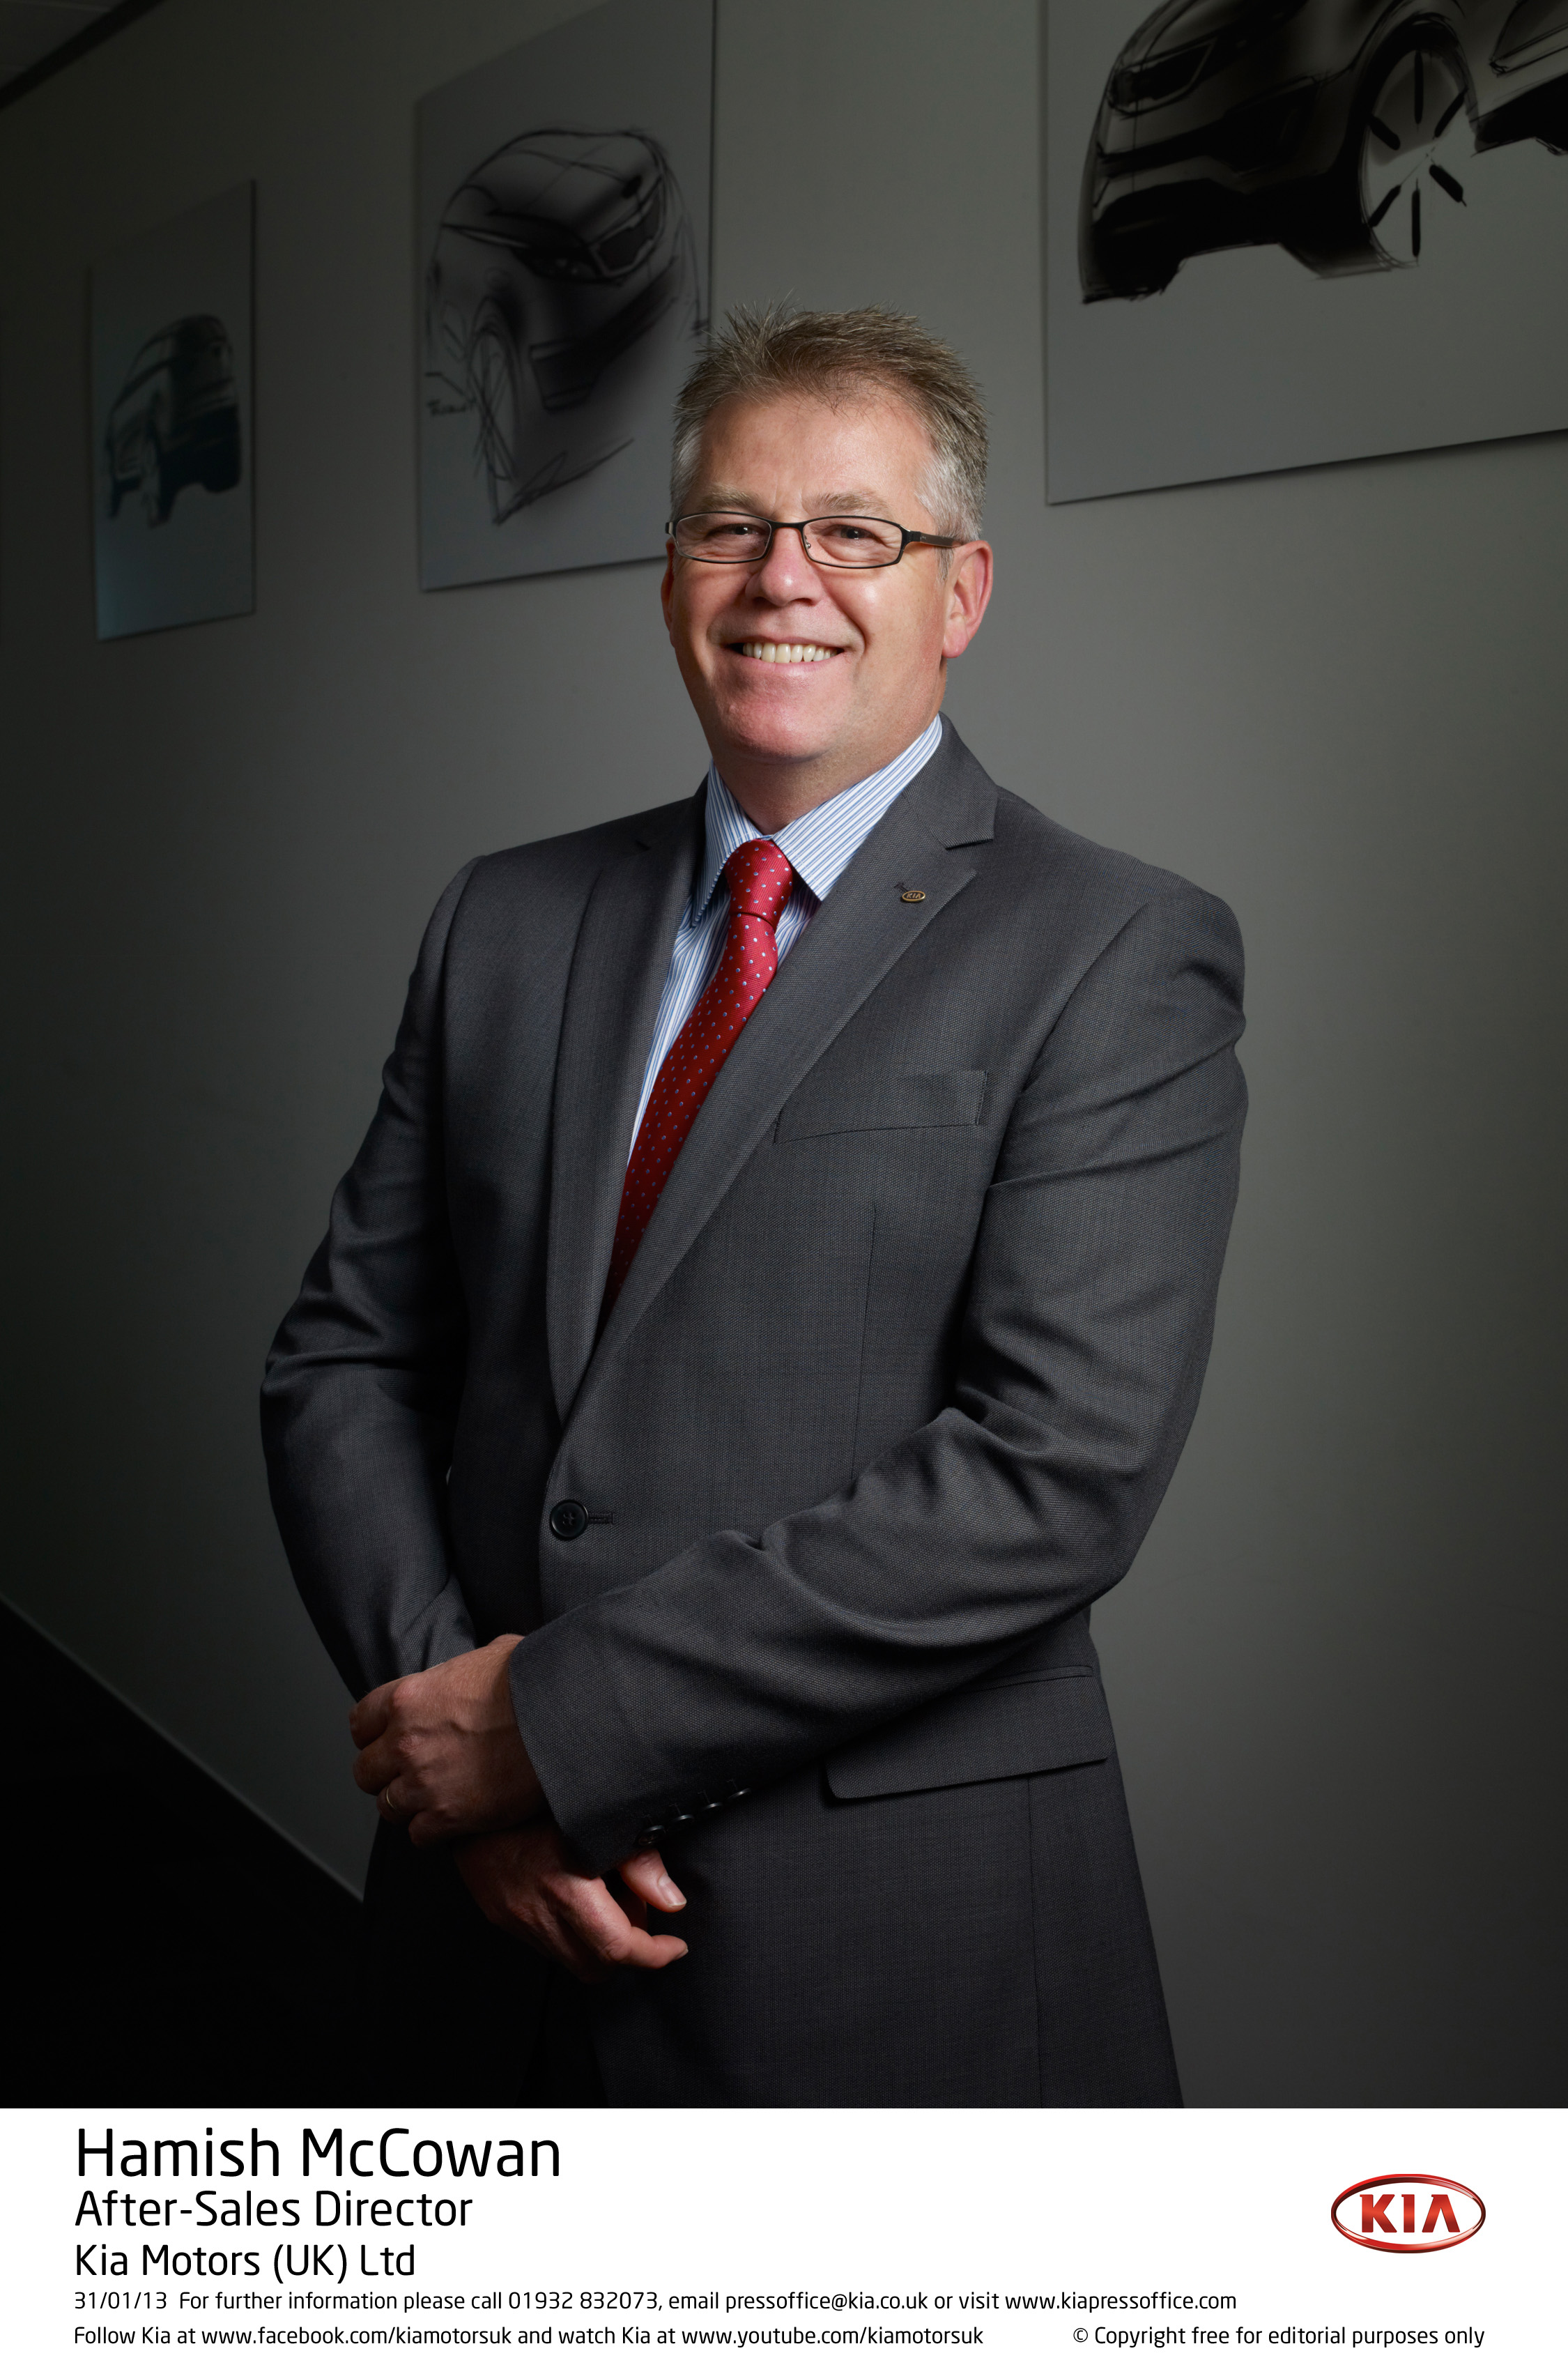 Hamish McCowan